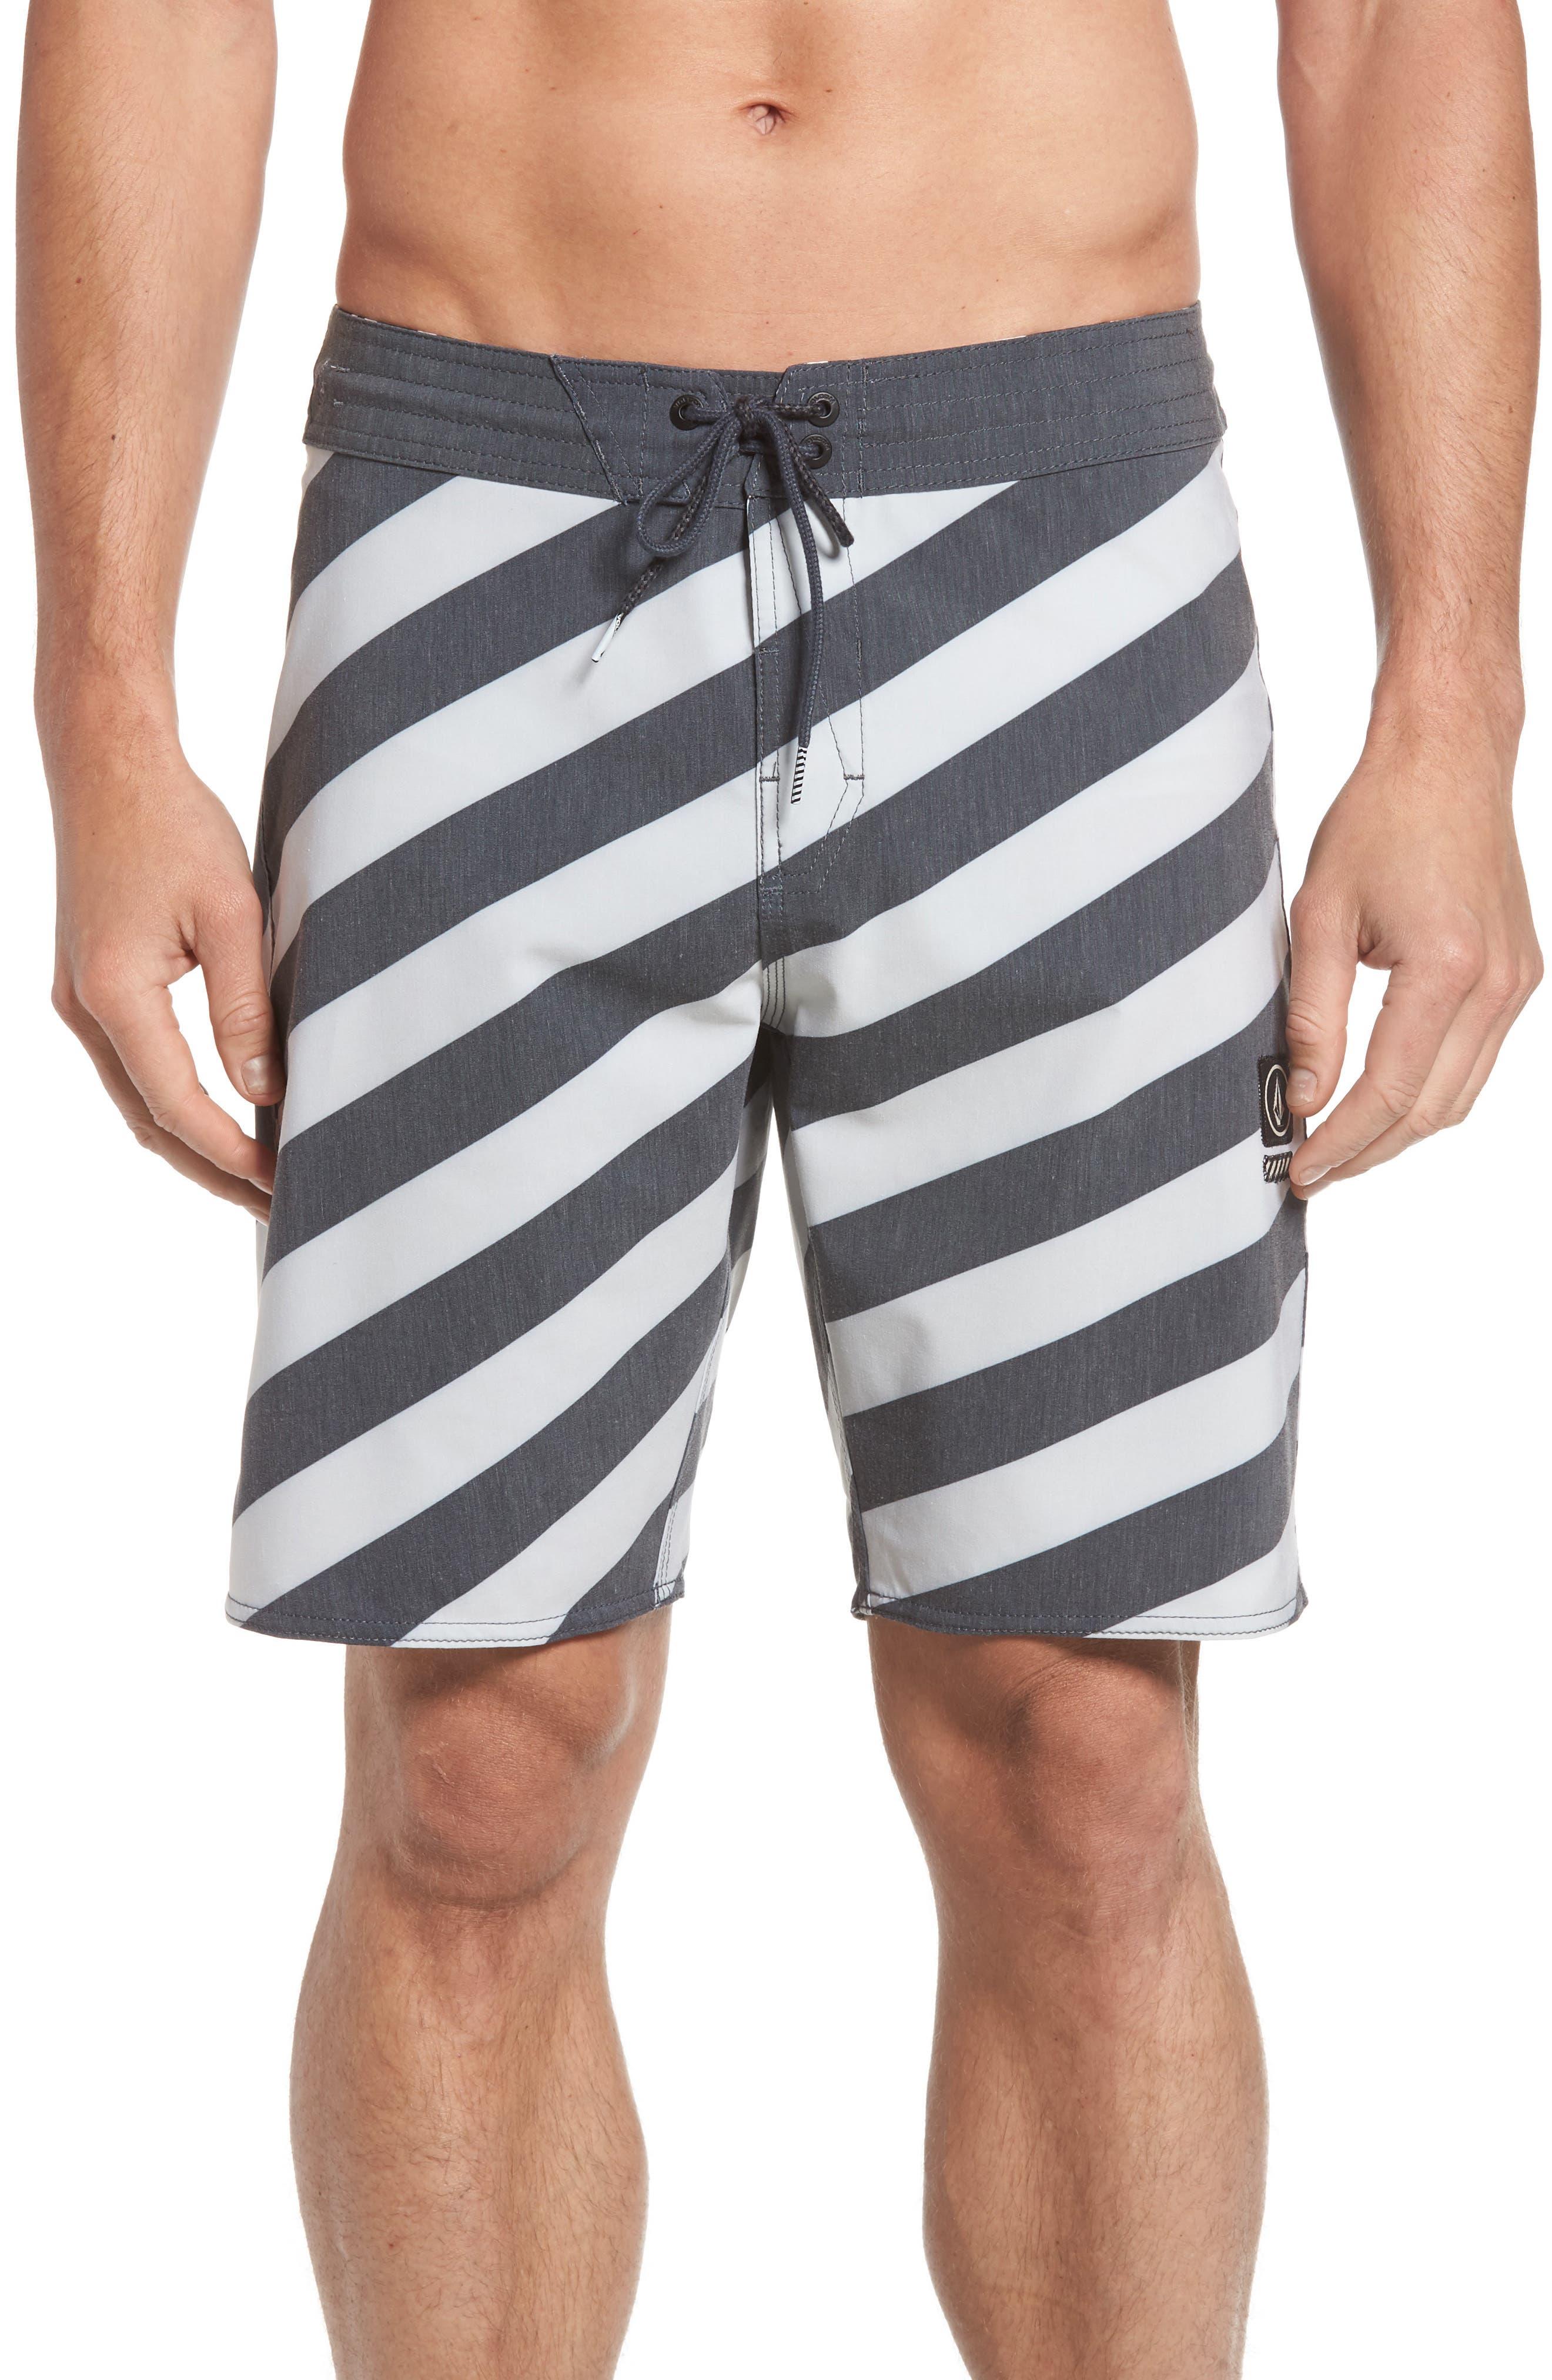 Stripey Slinger Board Shorts,                             Main thumbnail 1, color,